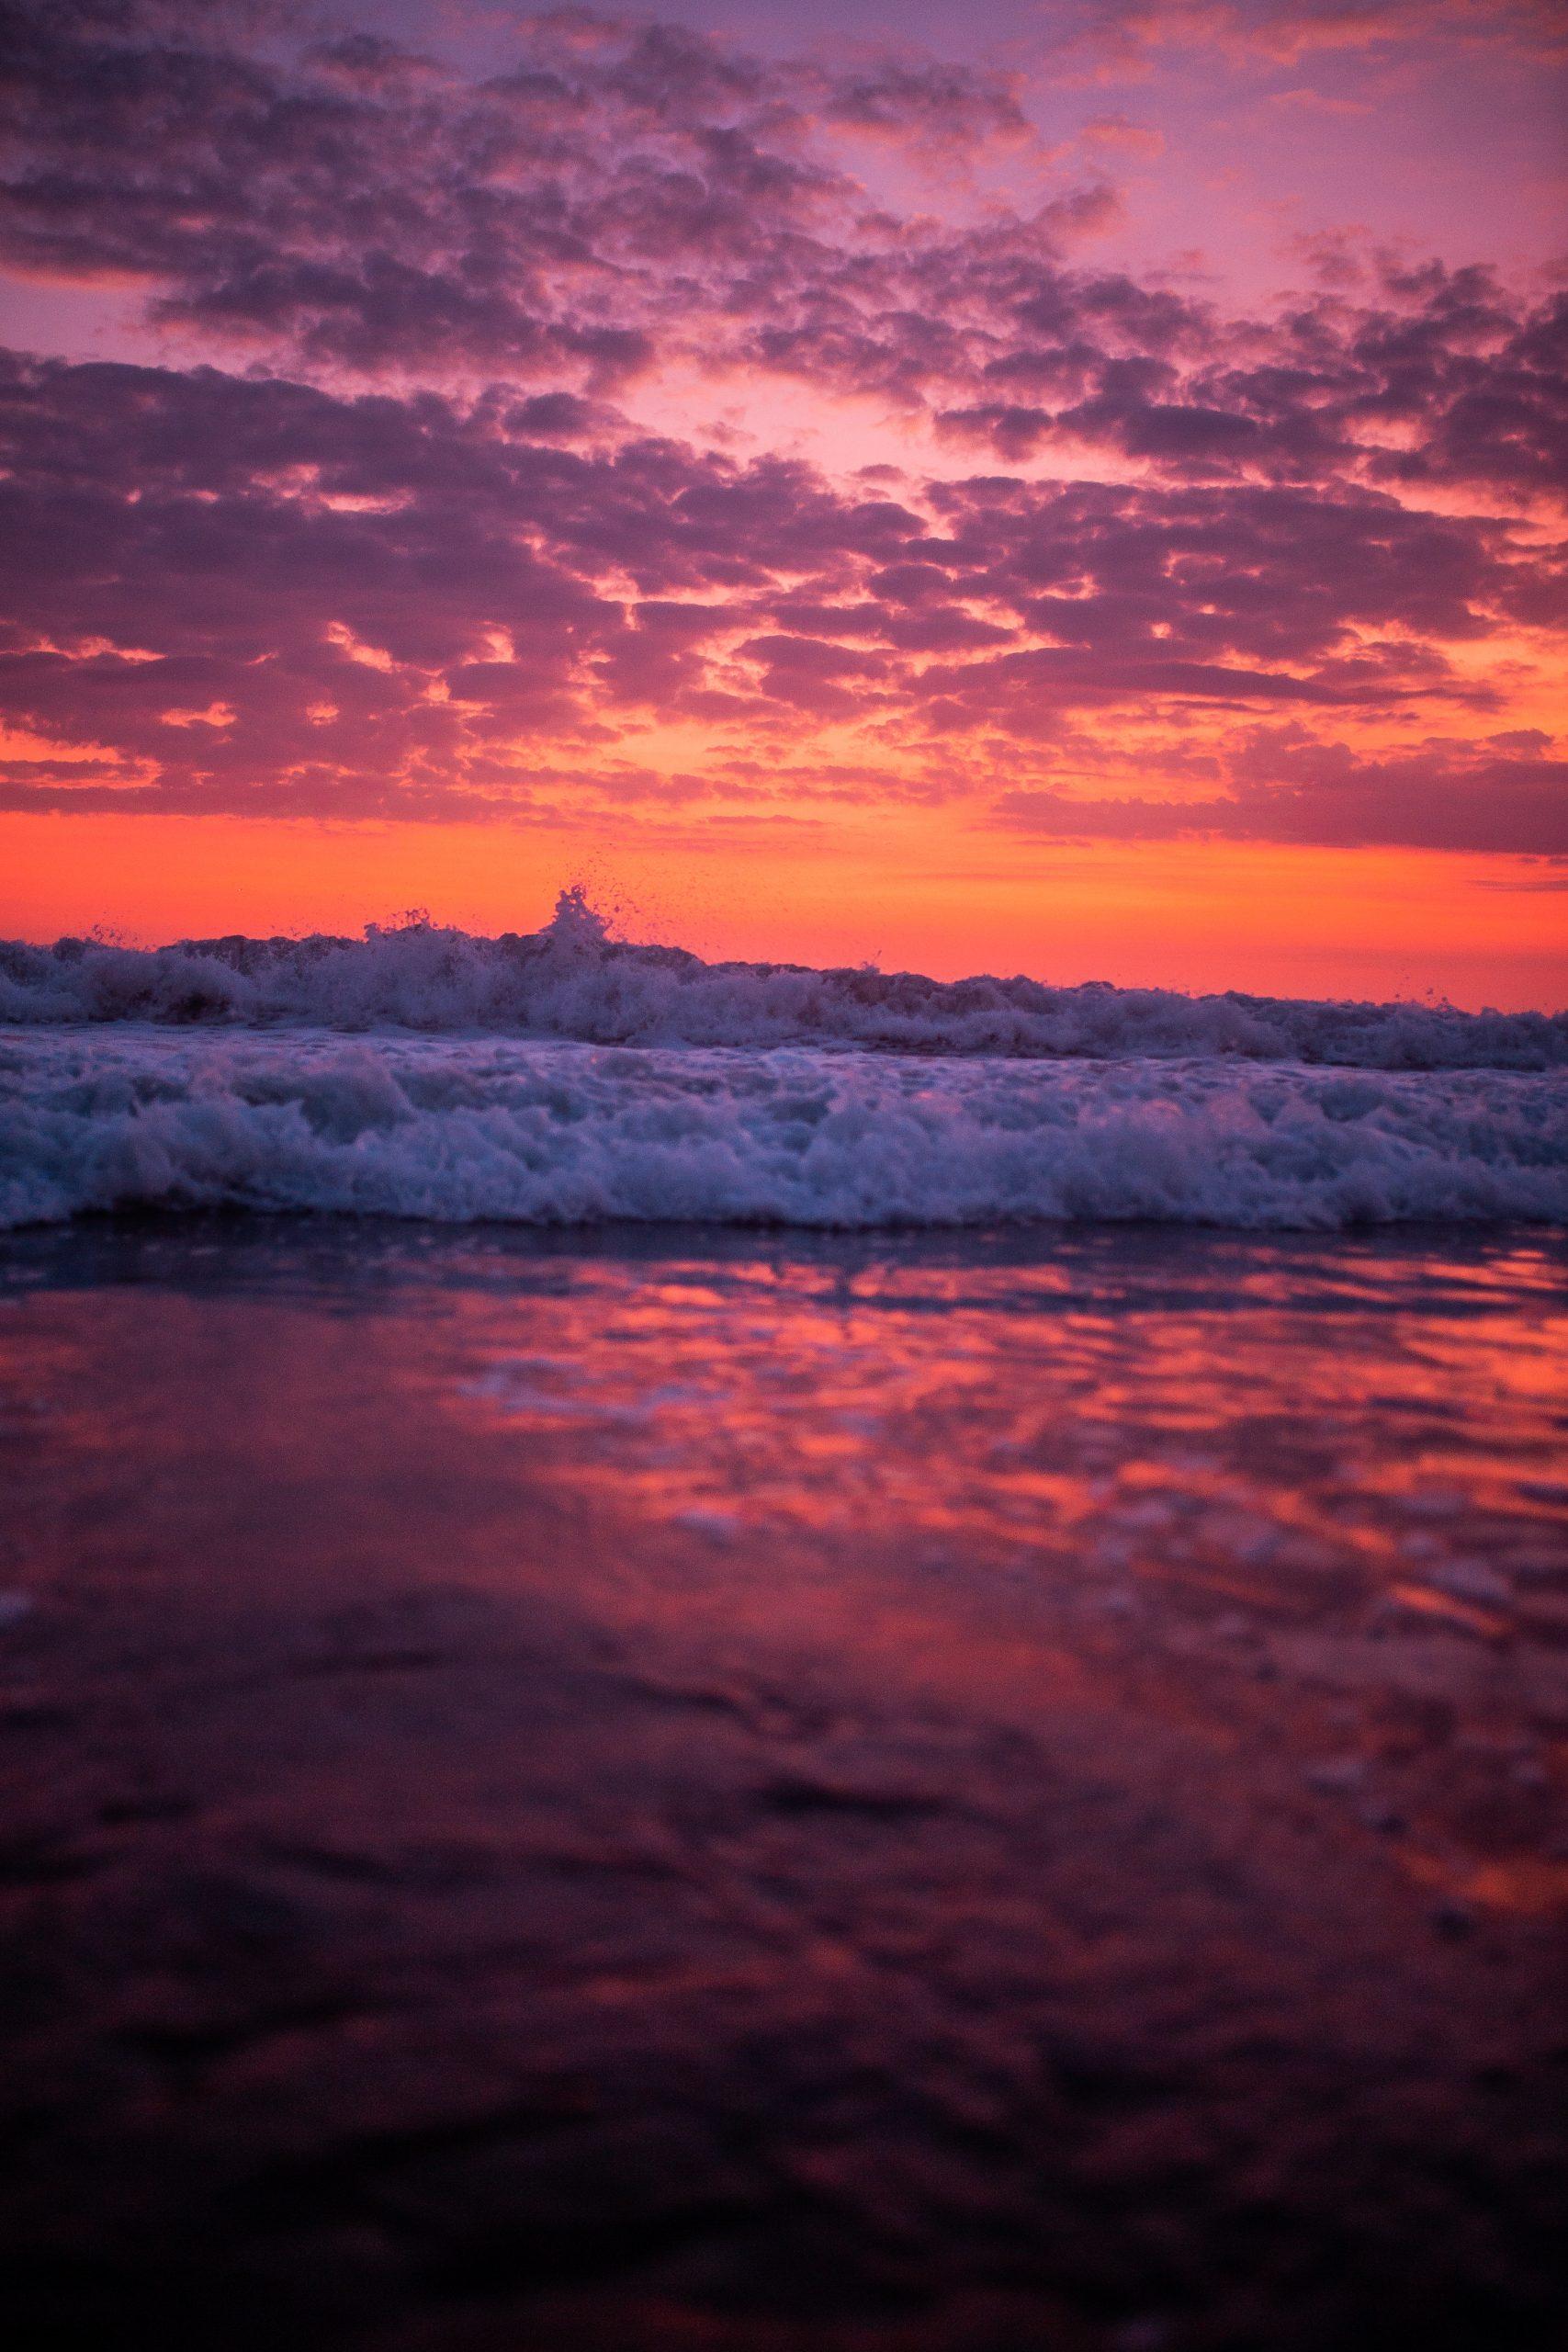 Bali Purple Sunset at ocean